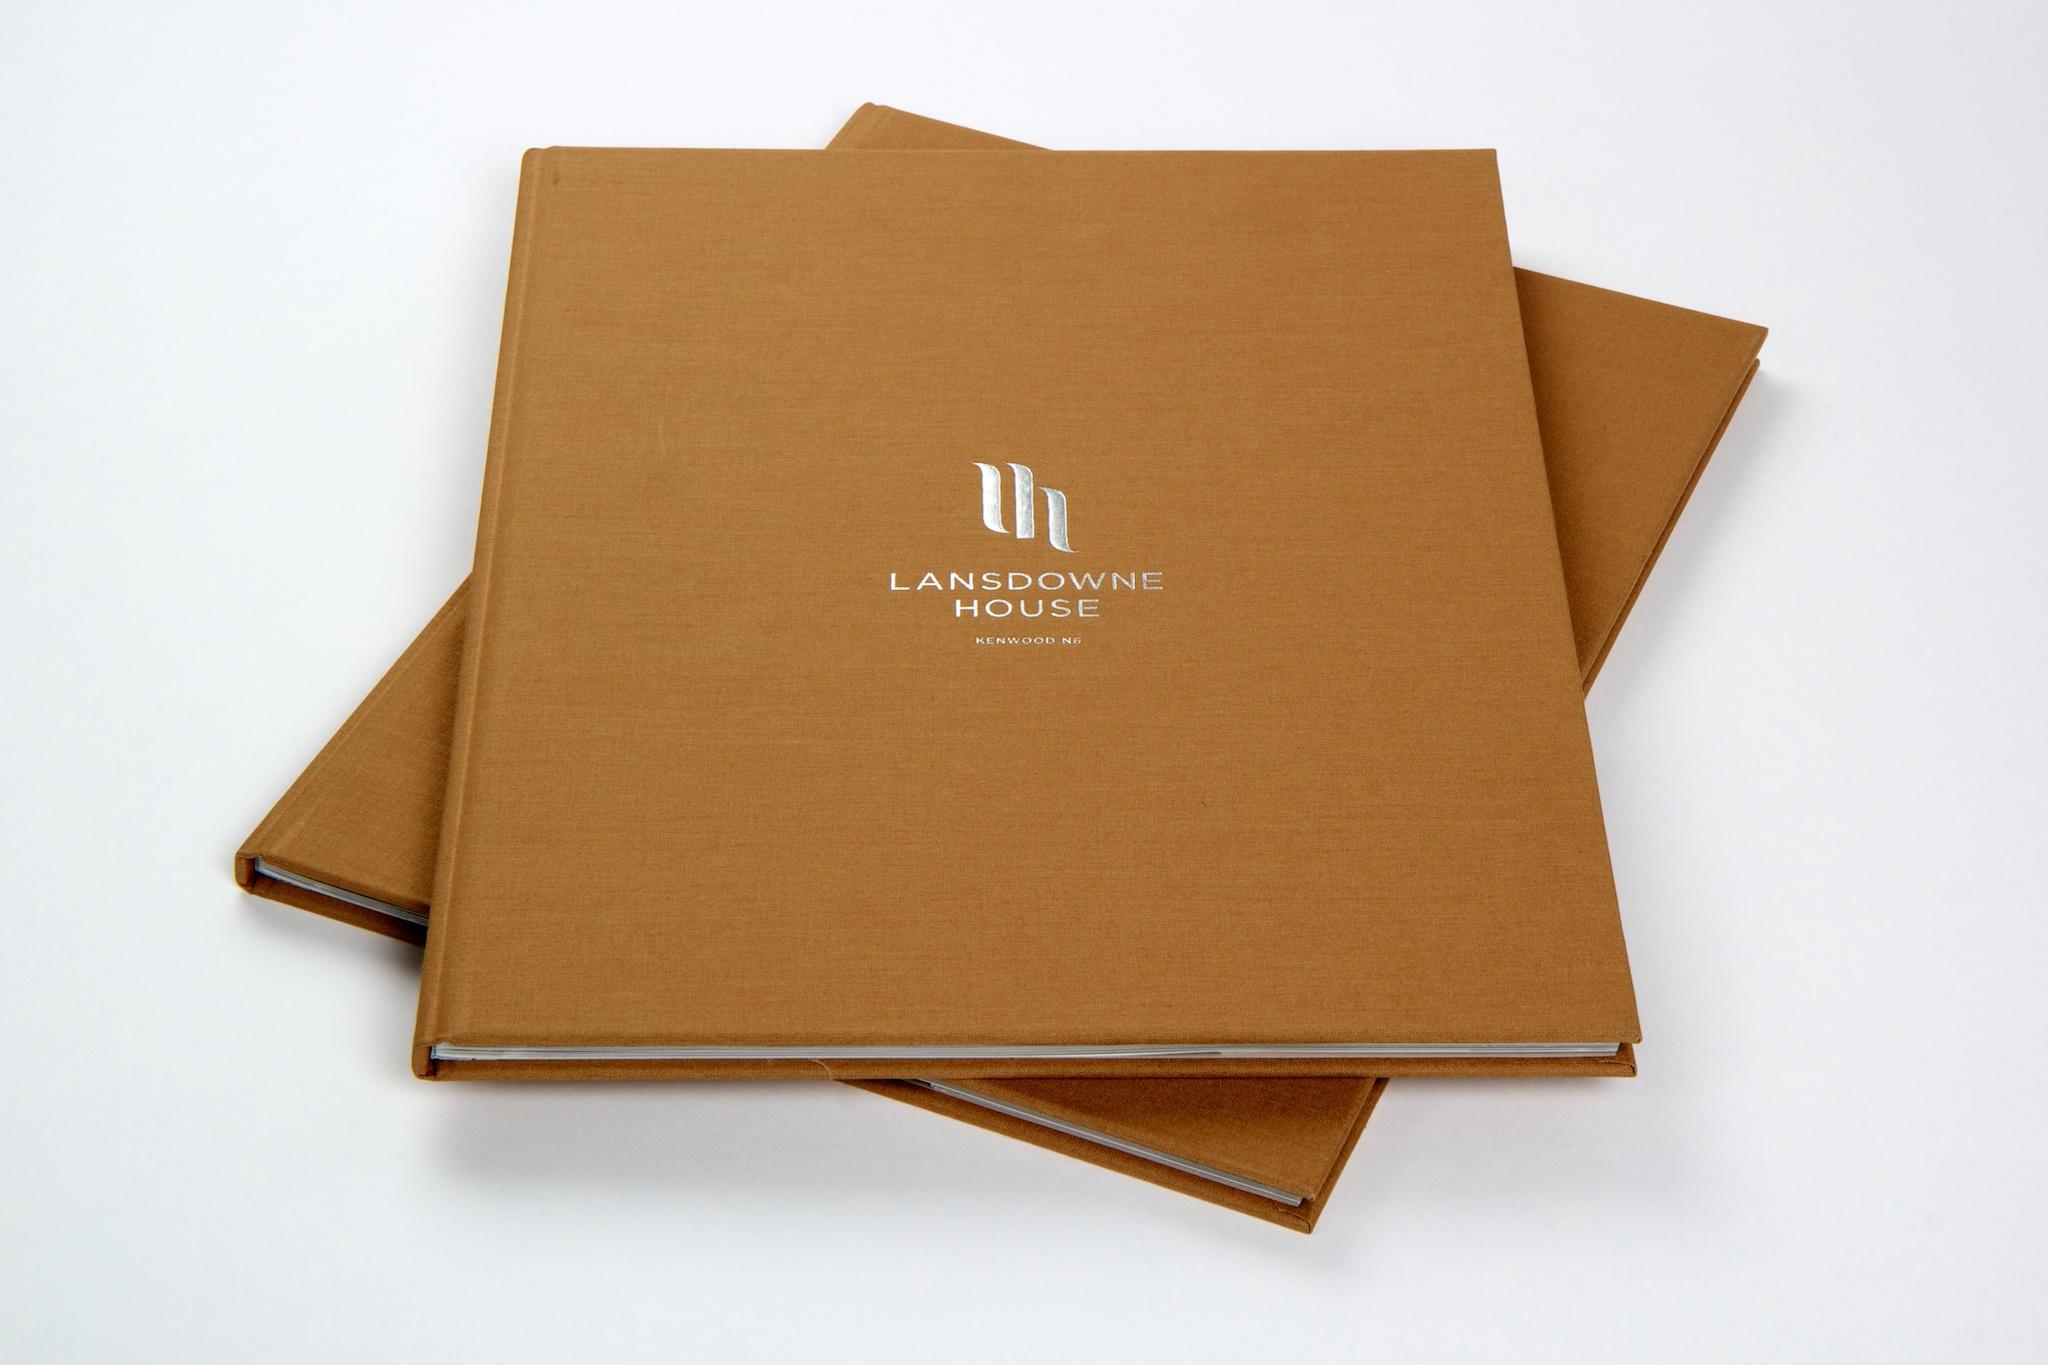 Lansdowne House Brochure